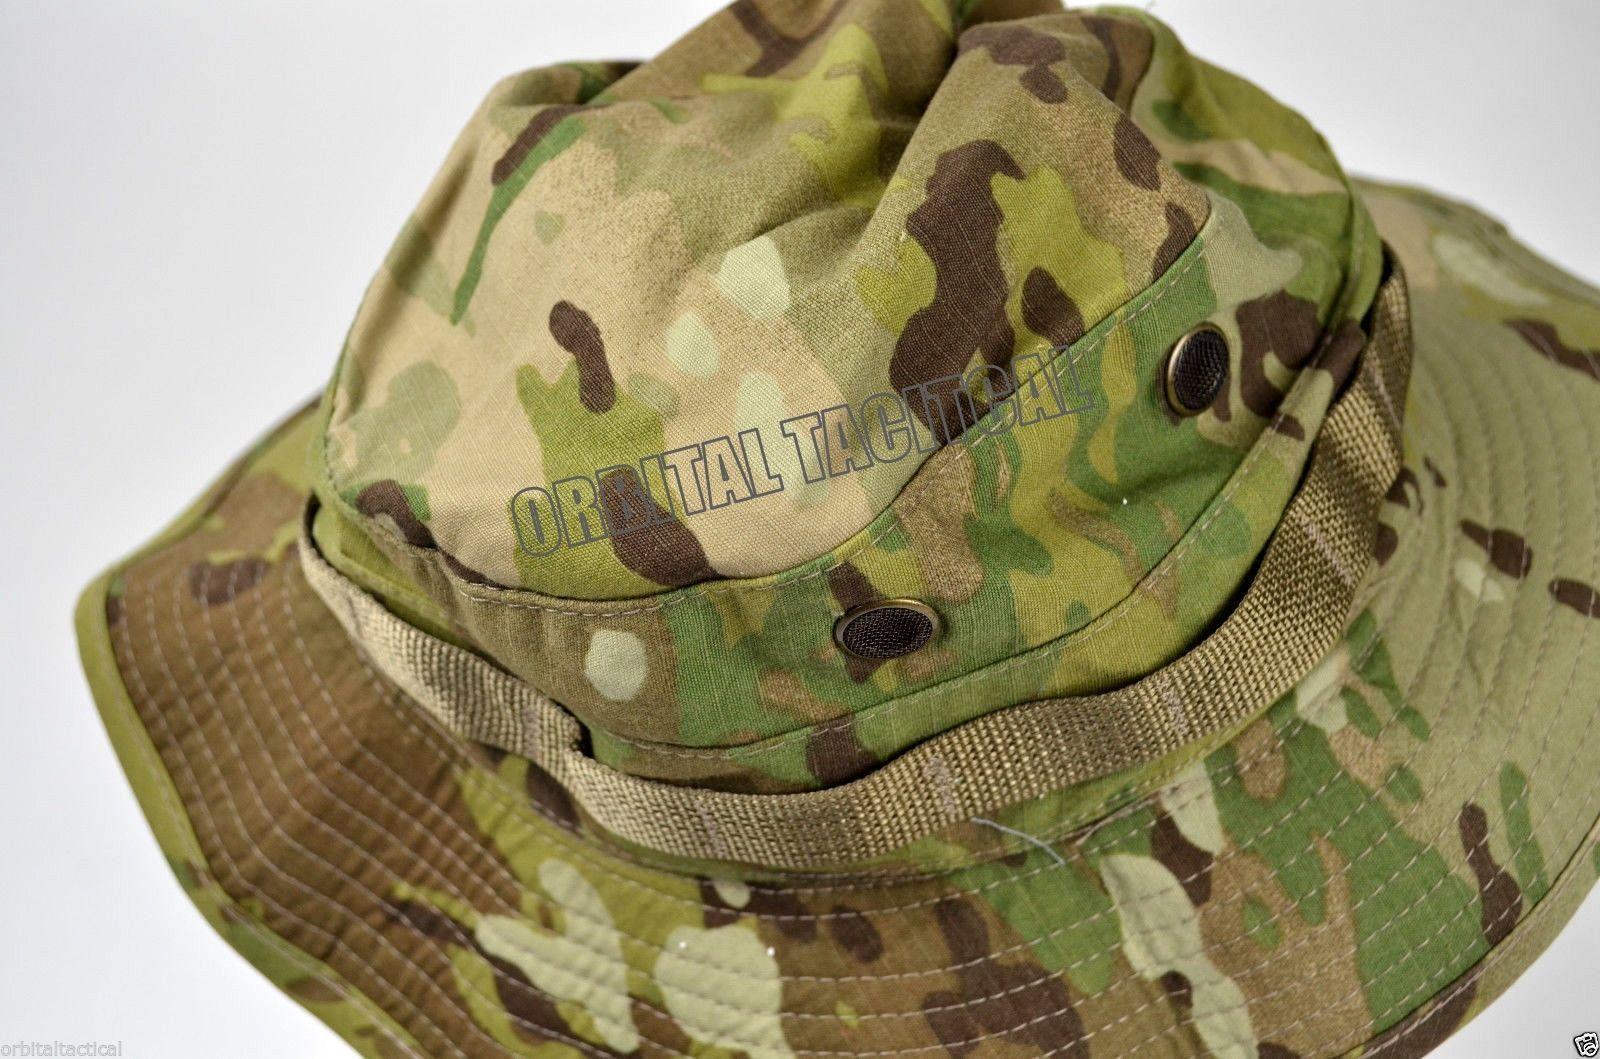 NEW USGI MILITARY ARMY MULTICAM OCP BOONIE HAT CAP - Orbital Tactical 0bfb5003ae7